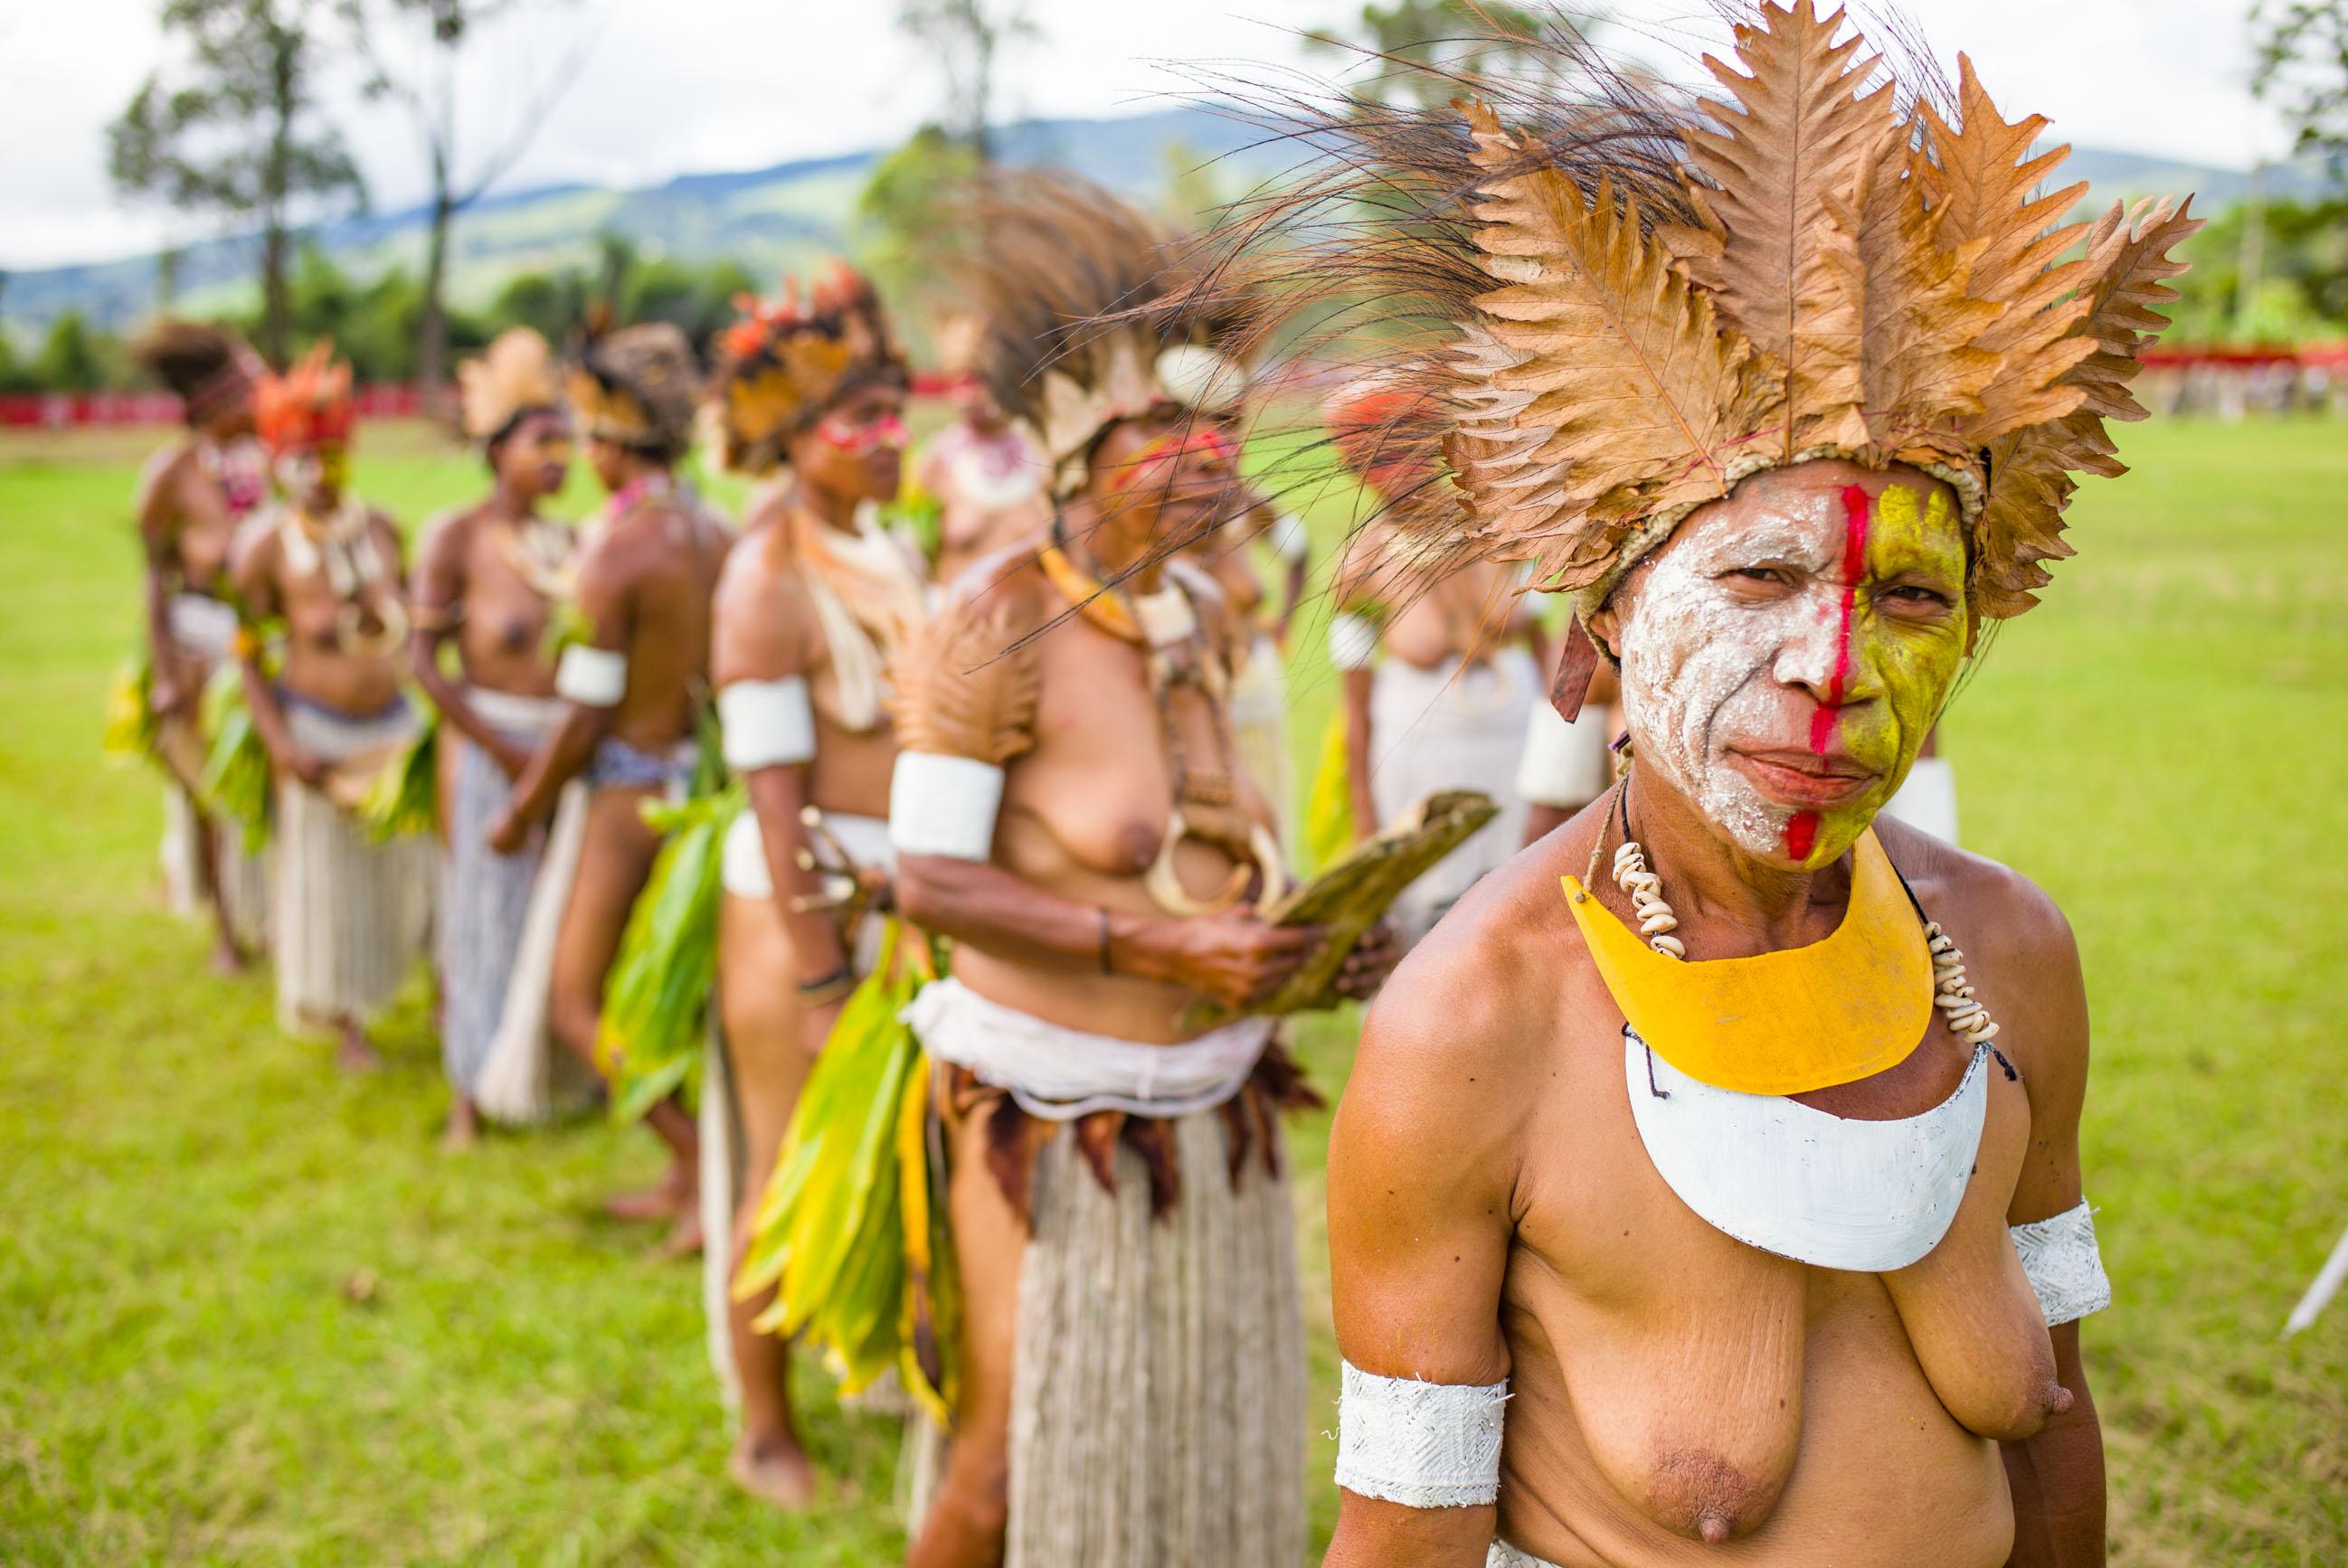 https://bubo.sk/uploads/galleries/7442/lubosfellner_papuanovaguinea_l1008707.jpg